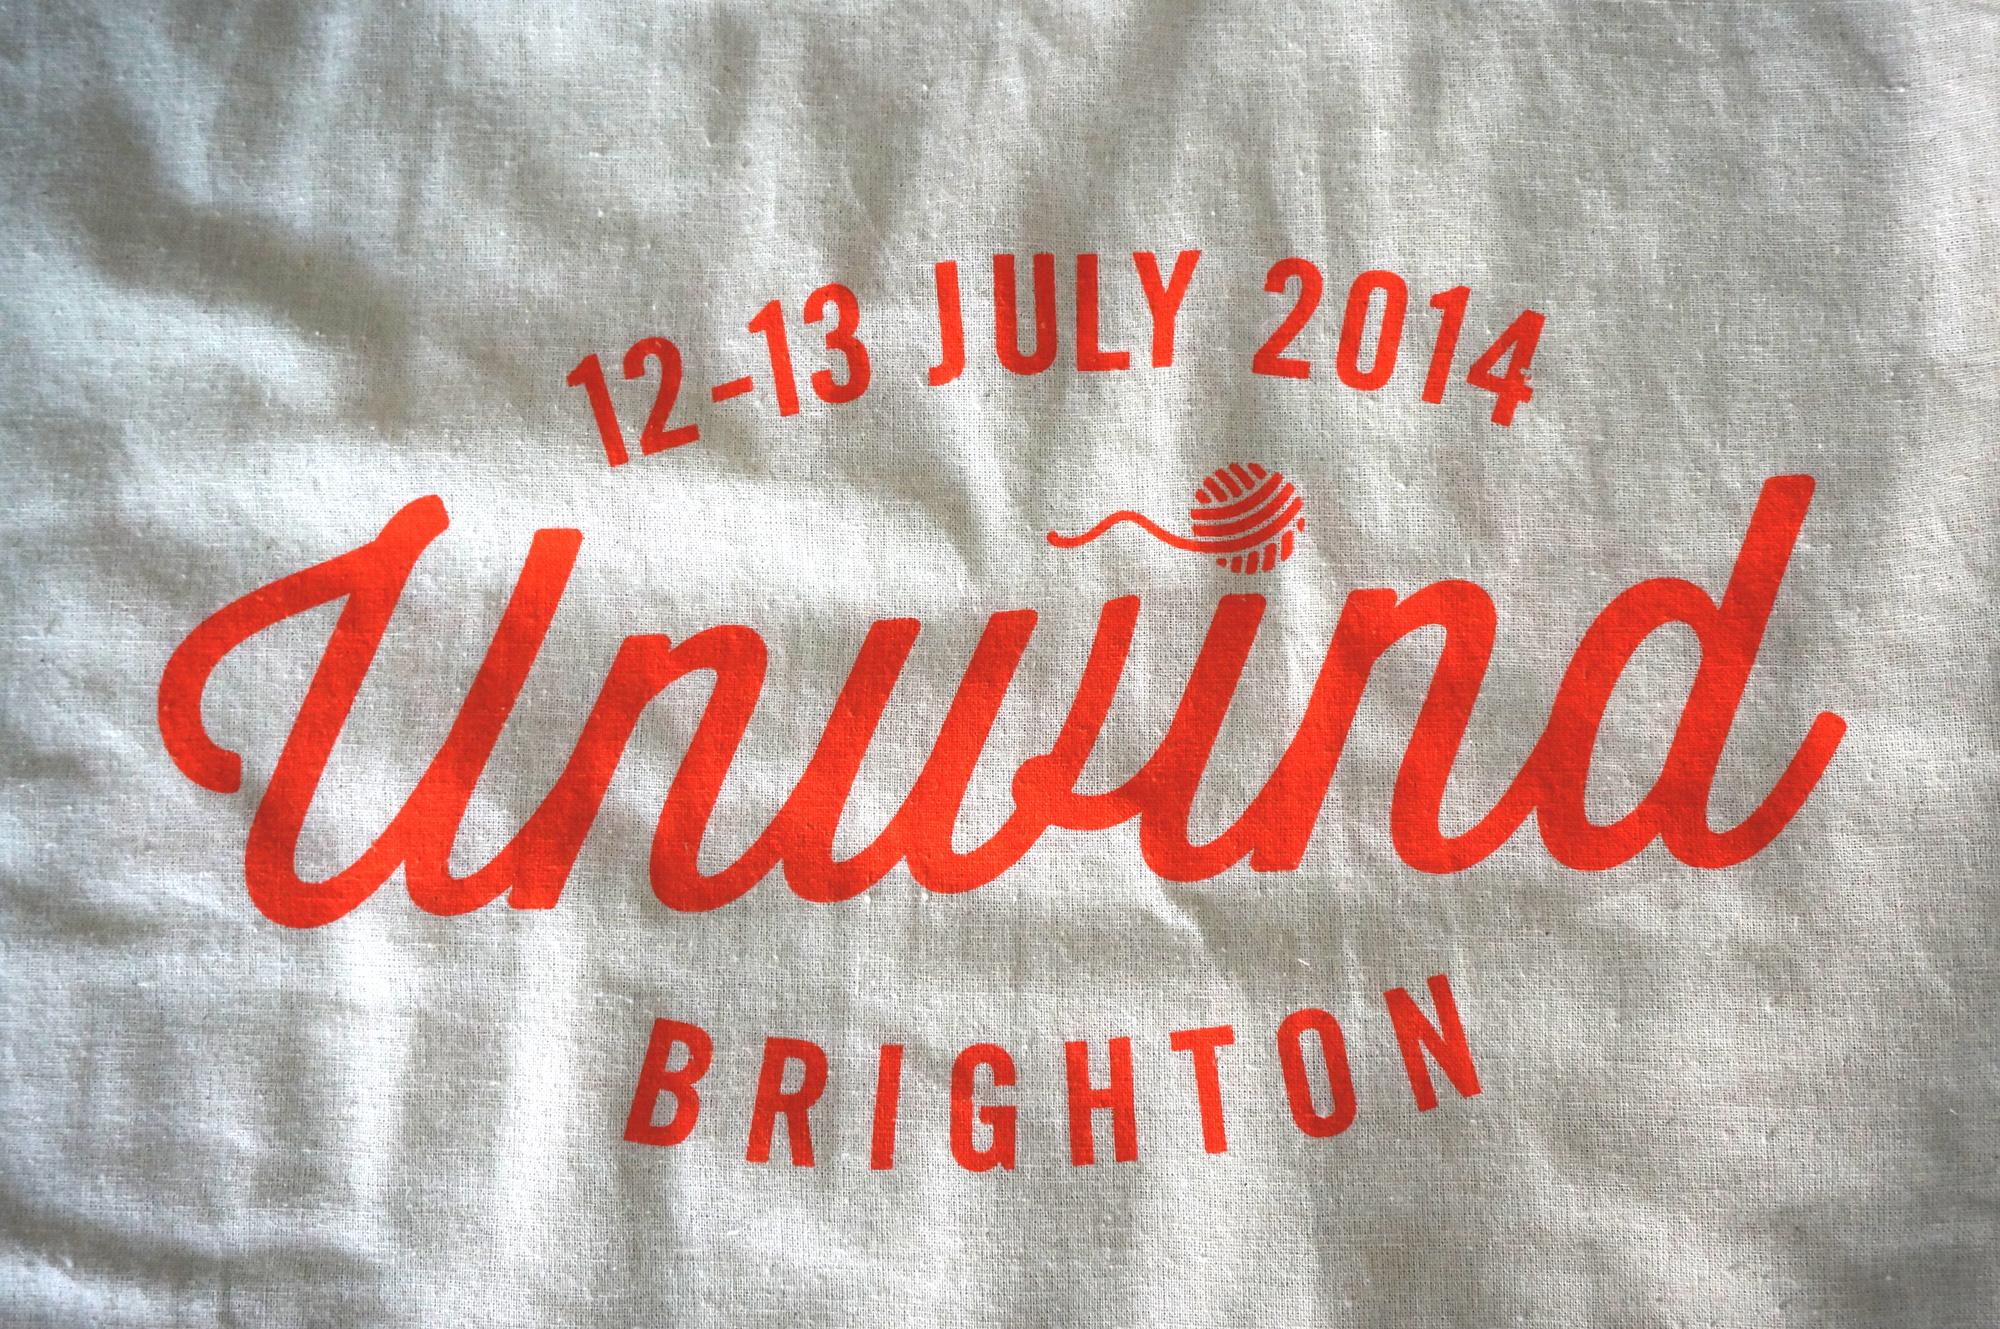 Unwind Brighton 2014